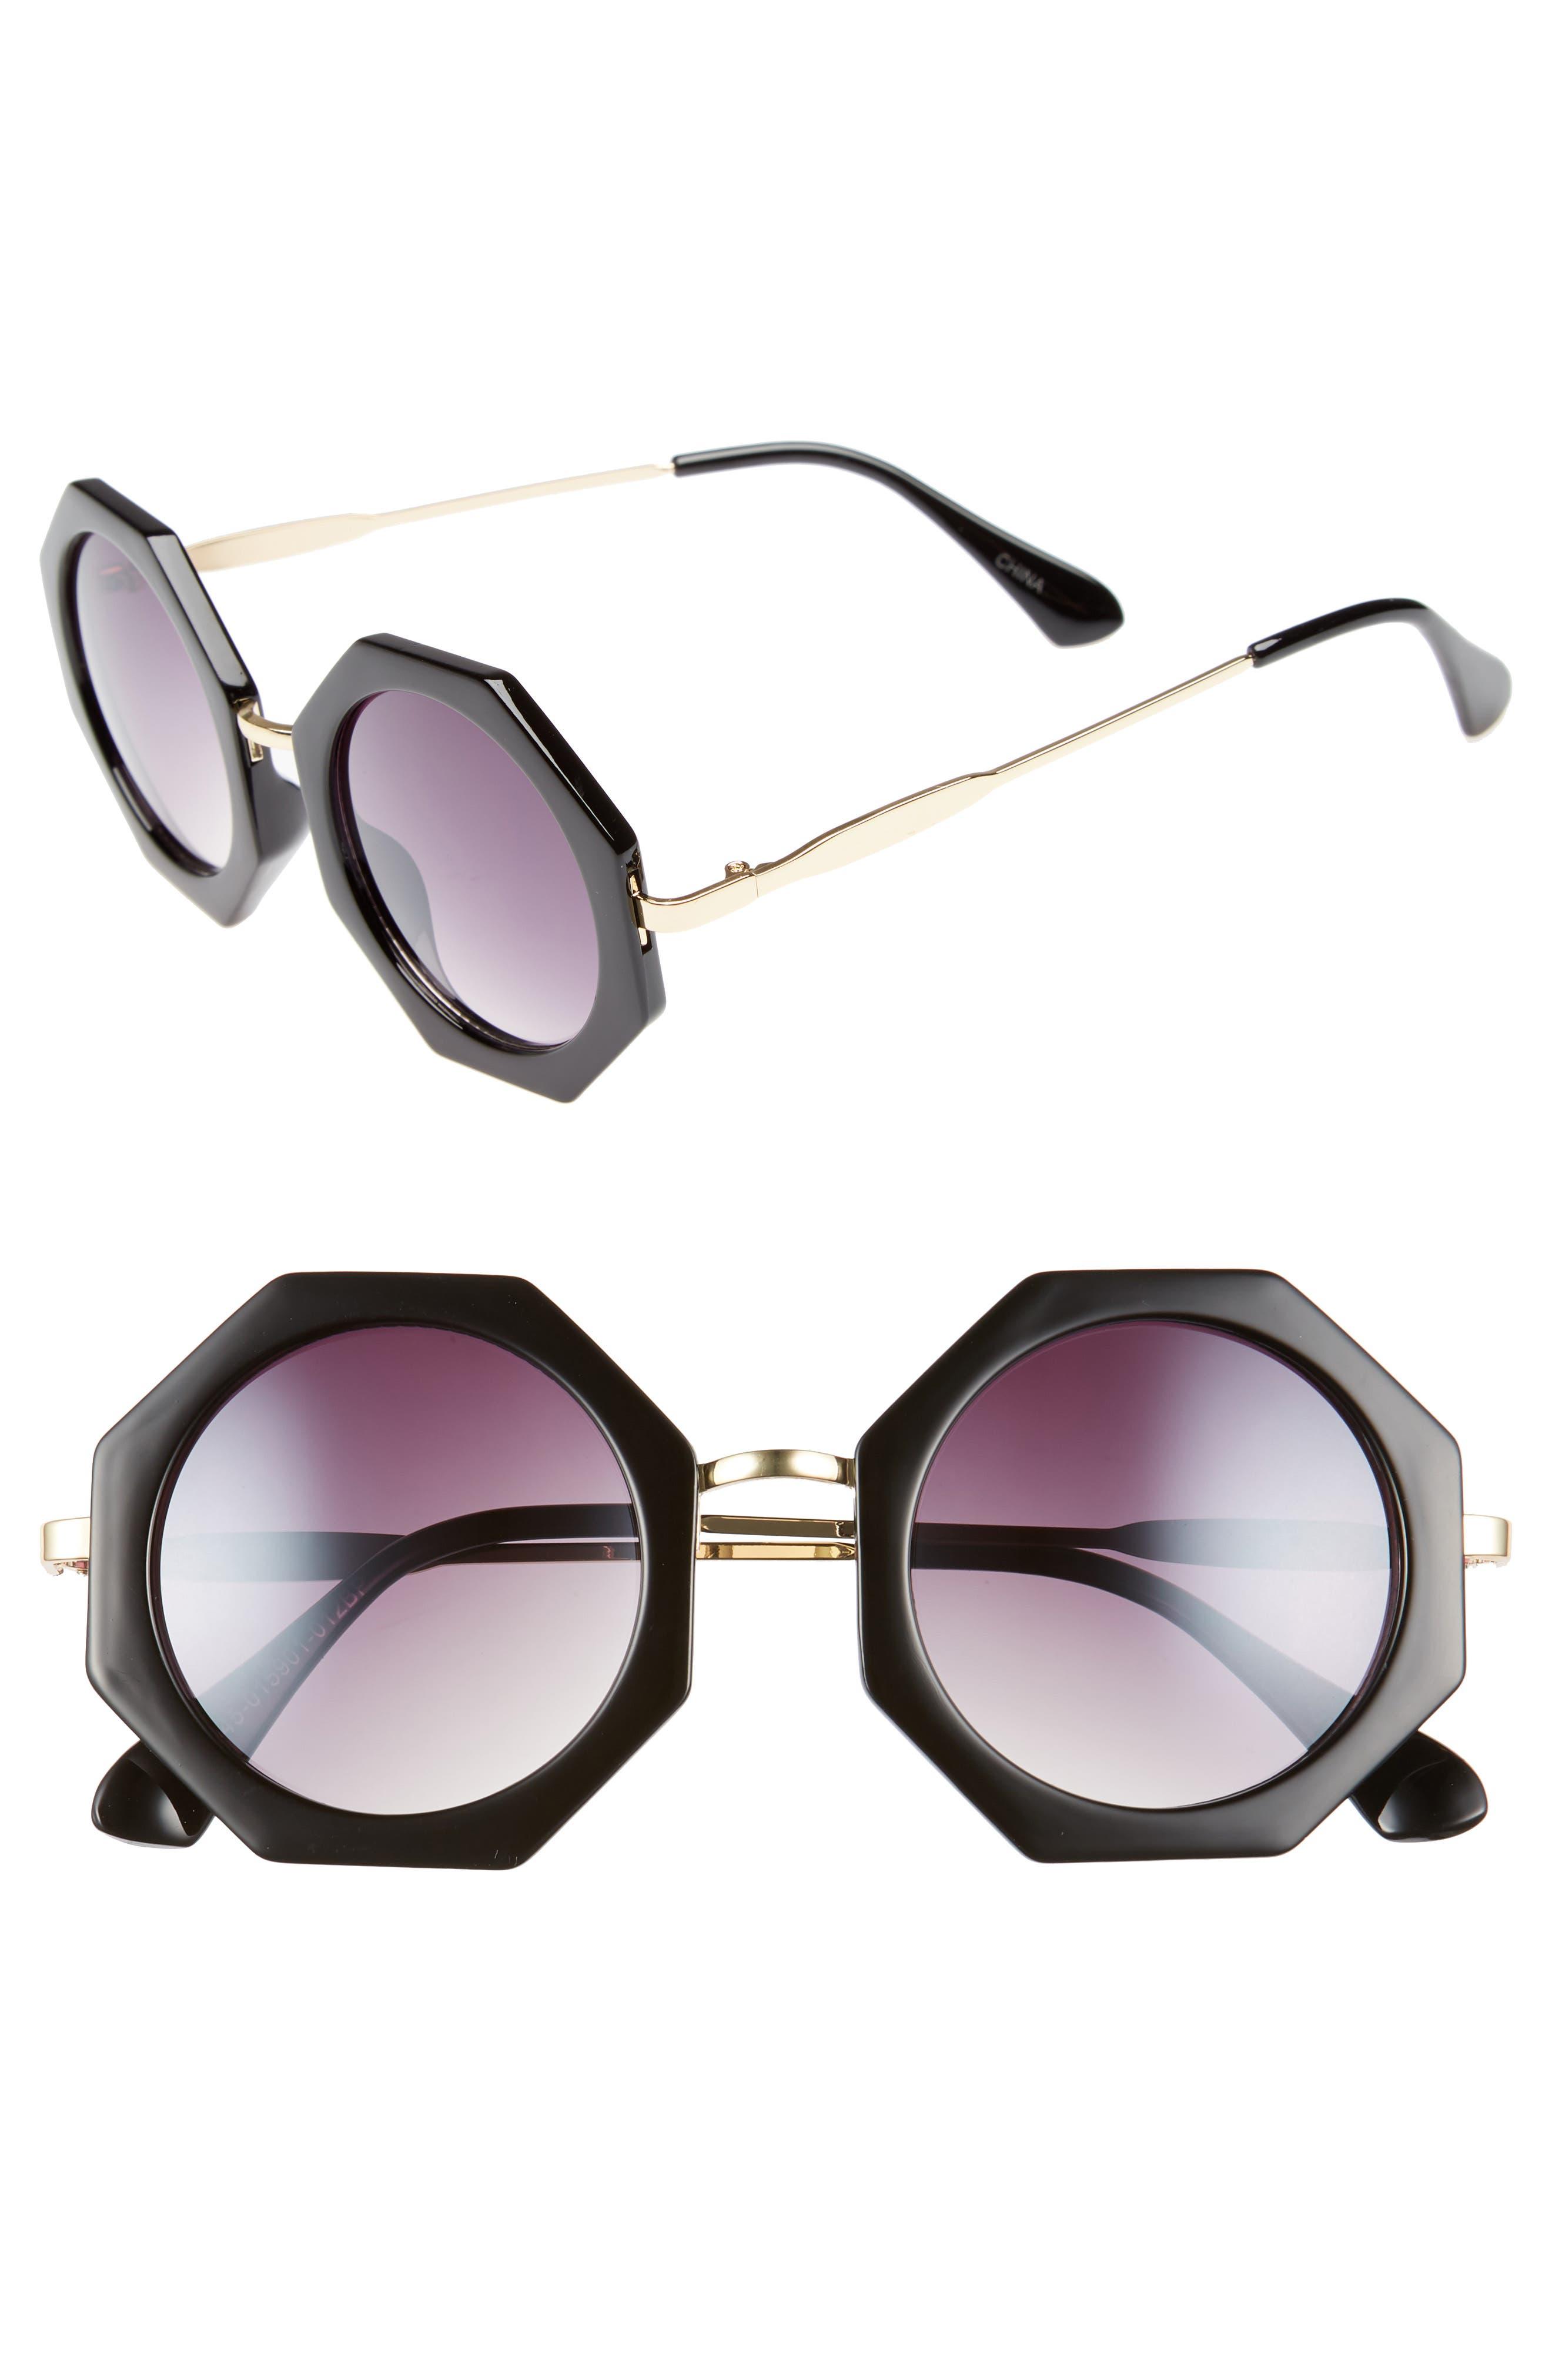 54m Hexagonal Sunglasses,                         Main,                         color, Black/ Gold